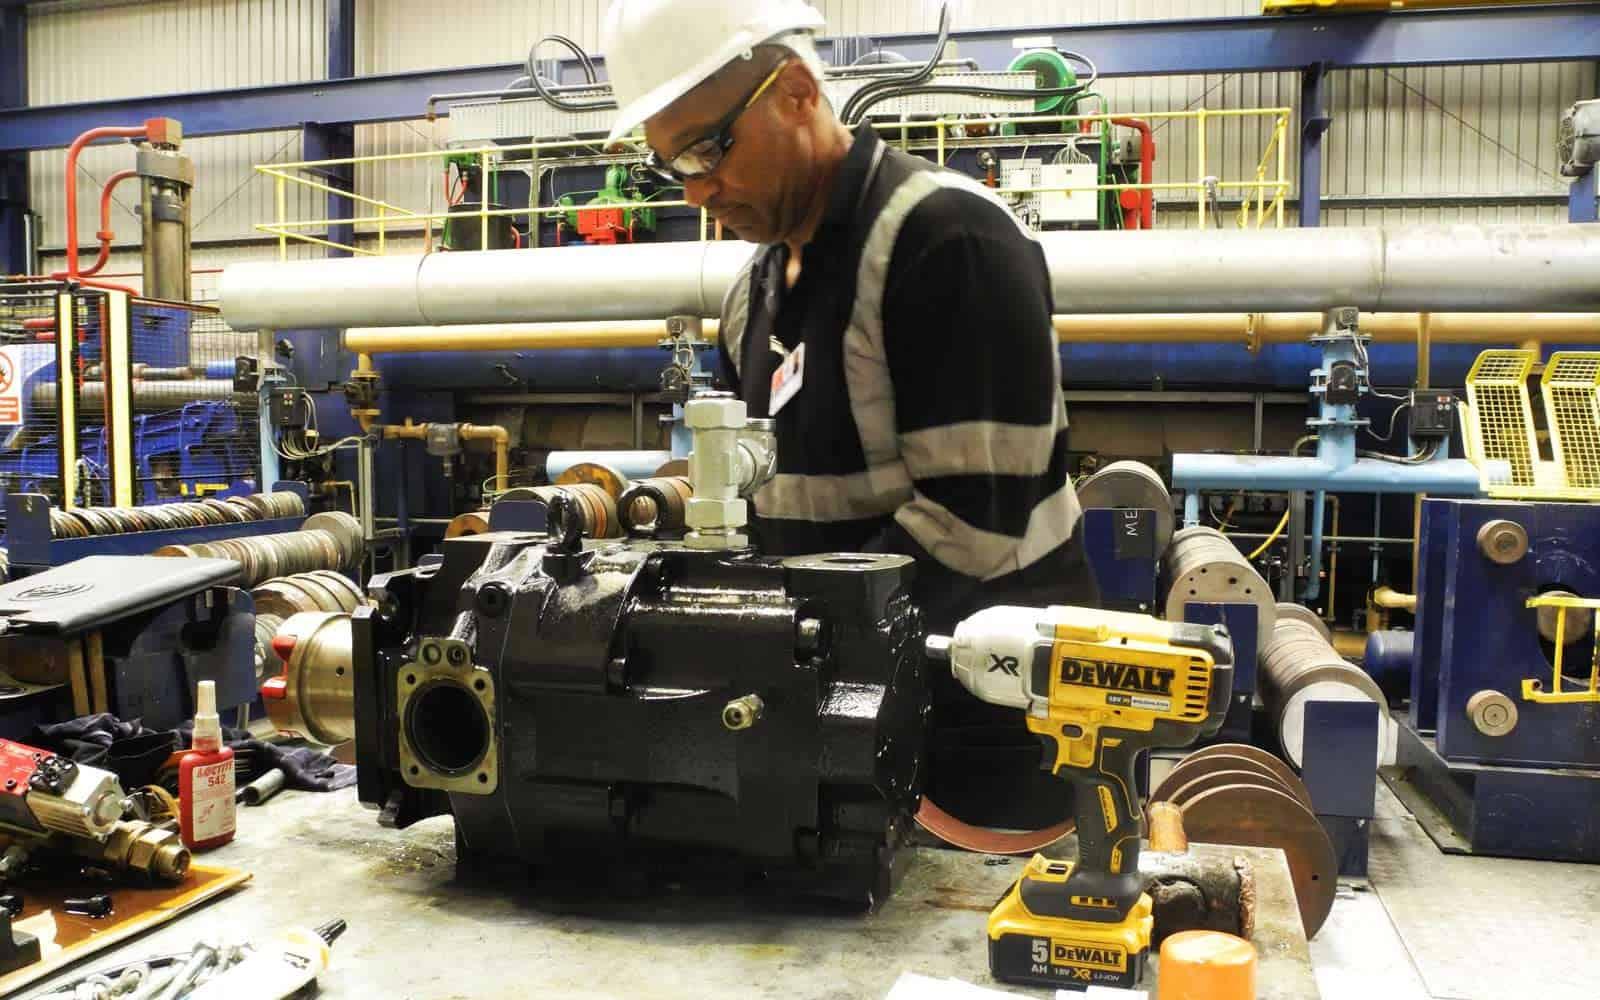 kevin from Hydrapress repairing hydraulics